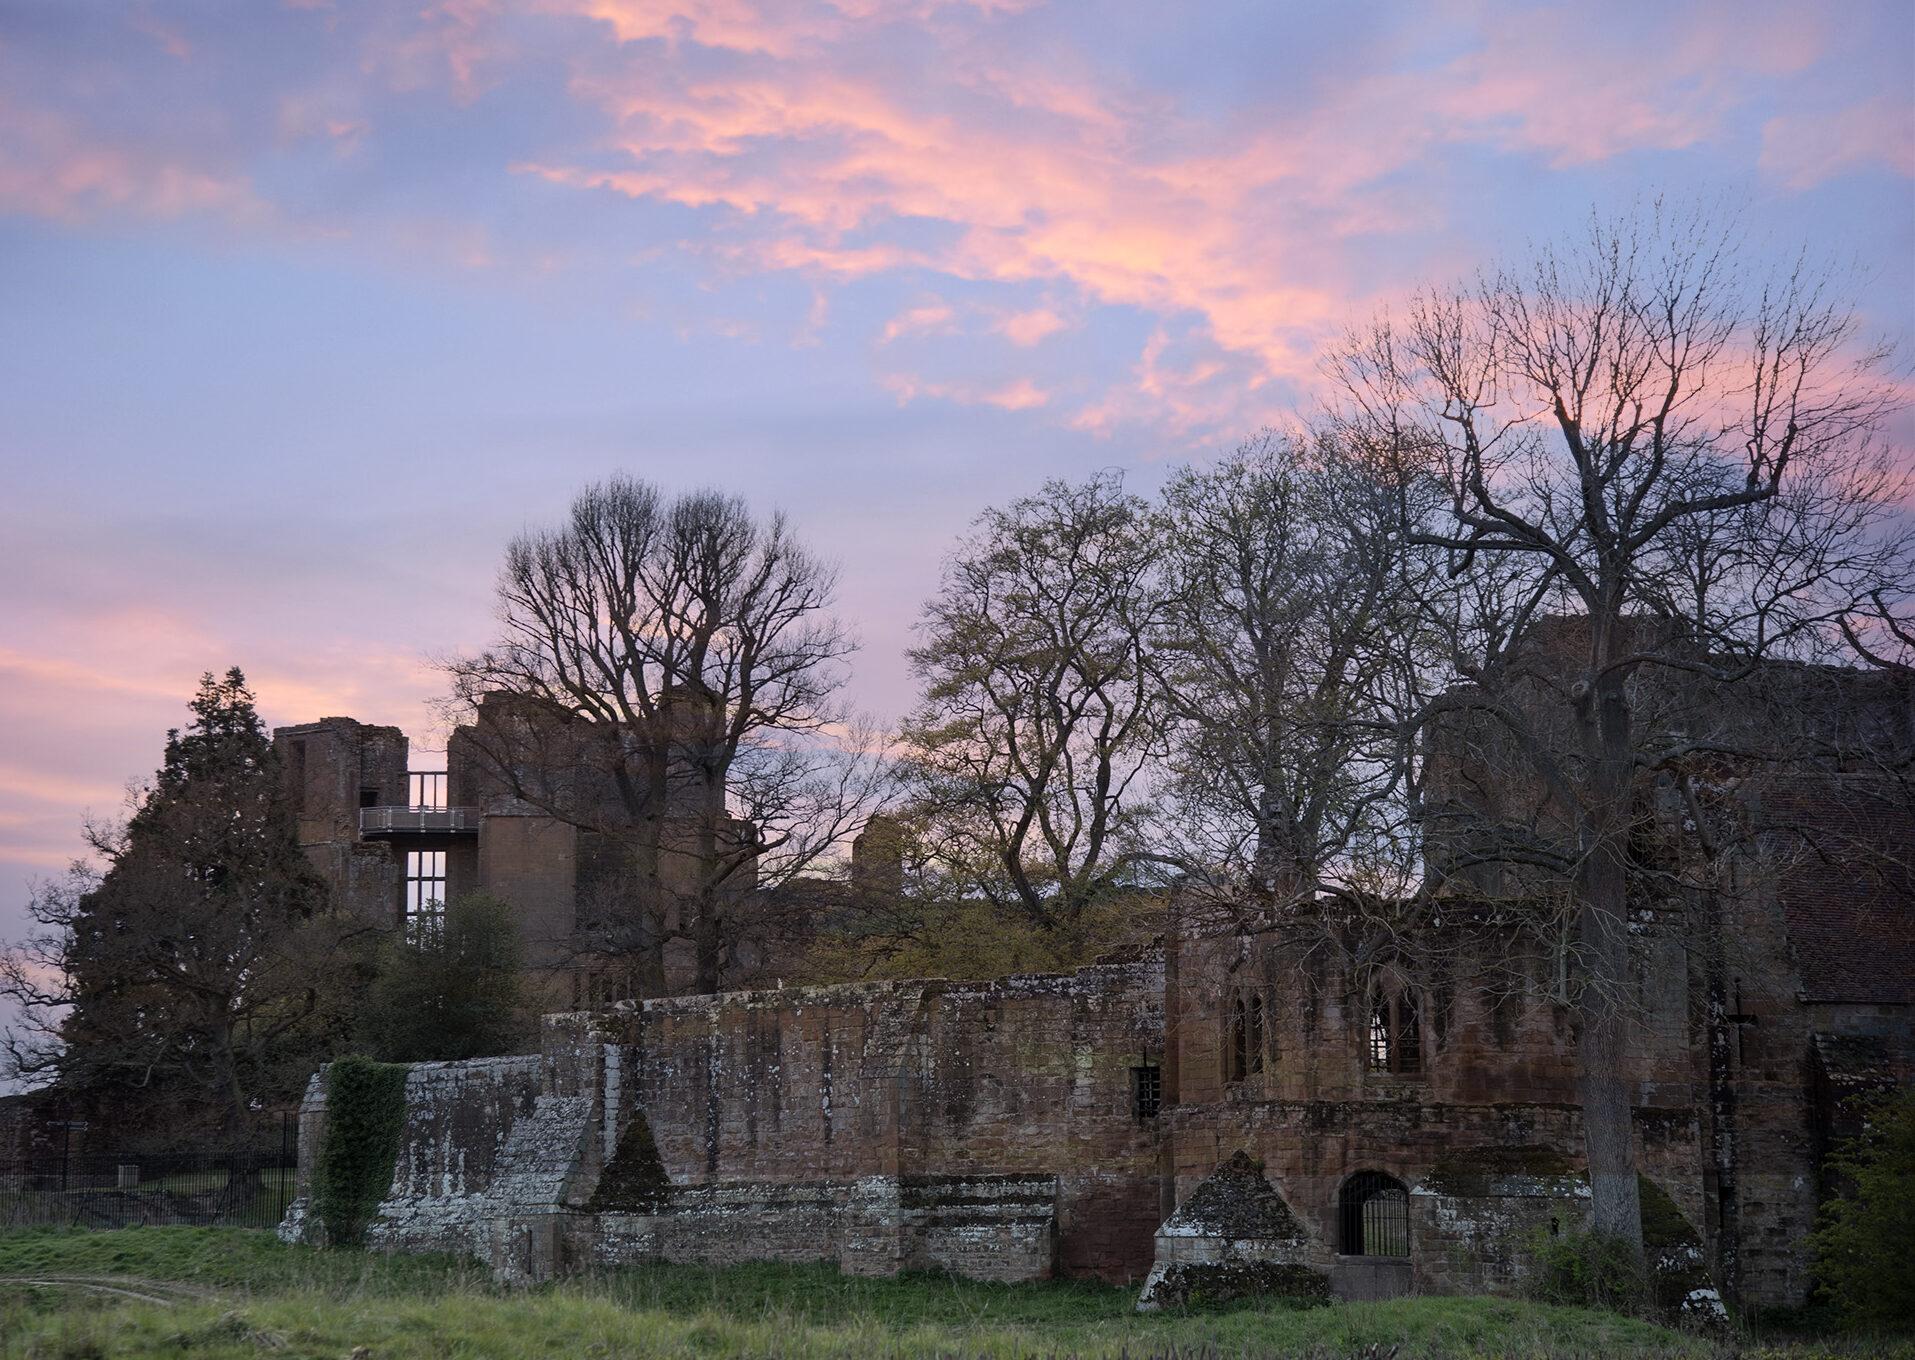 Sunset over Kenilworth Castle